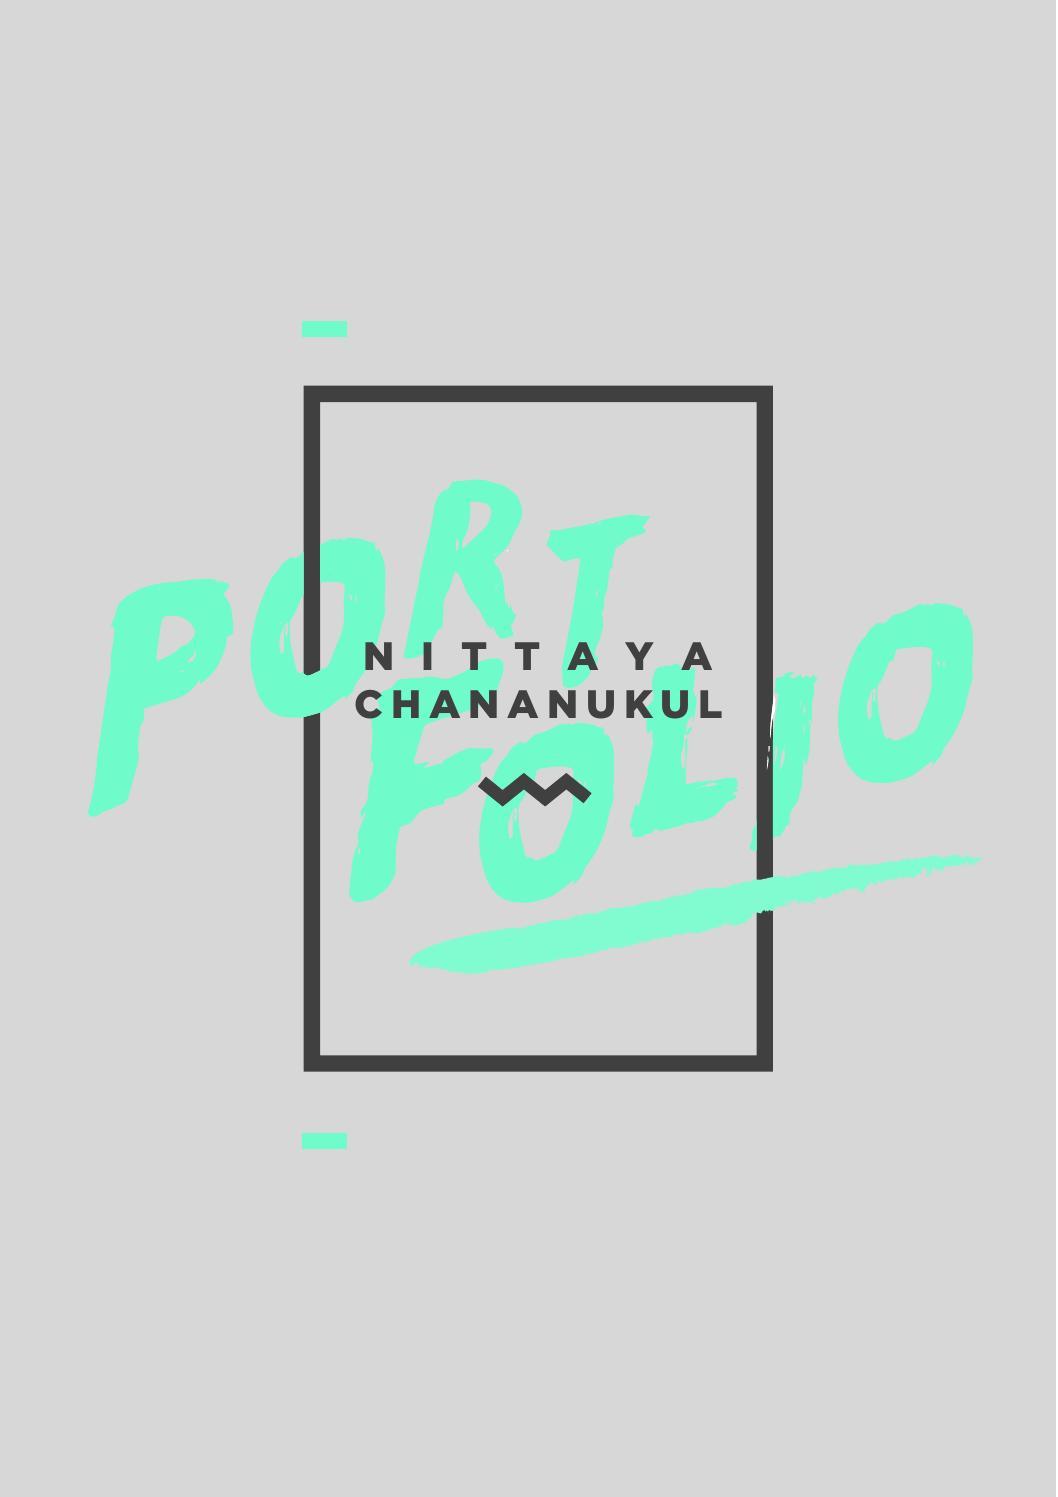 Portfolio For Vanilla By Coundsheck Chananukul Issuu